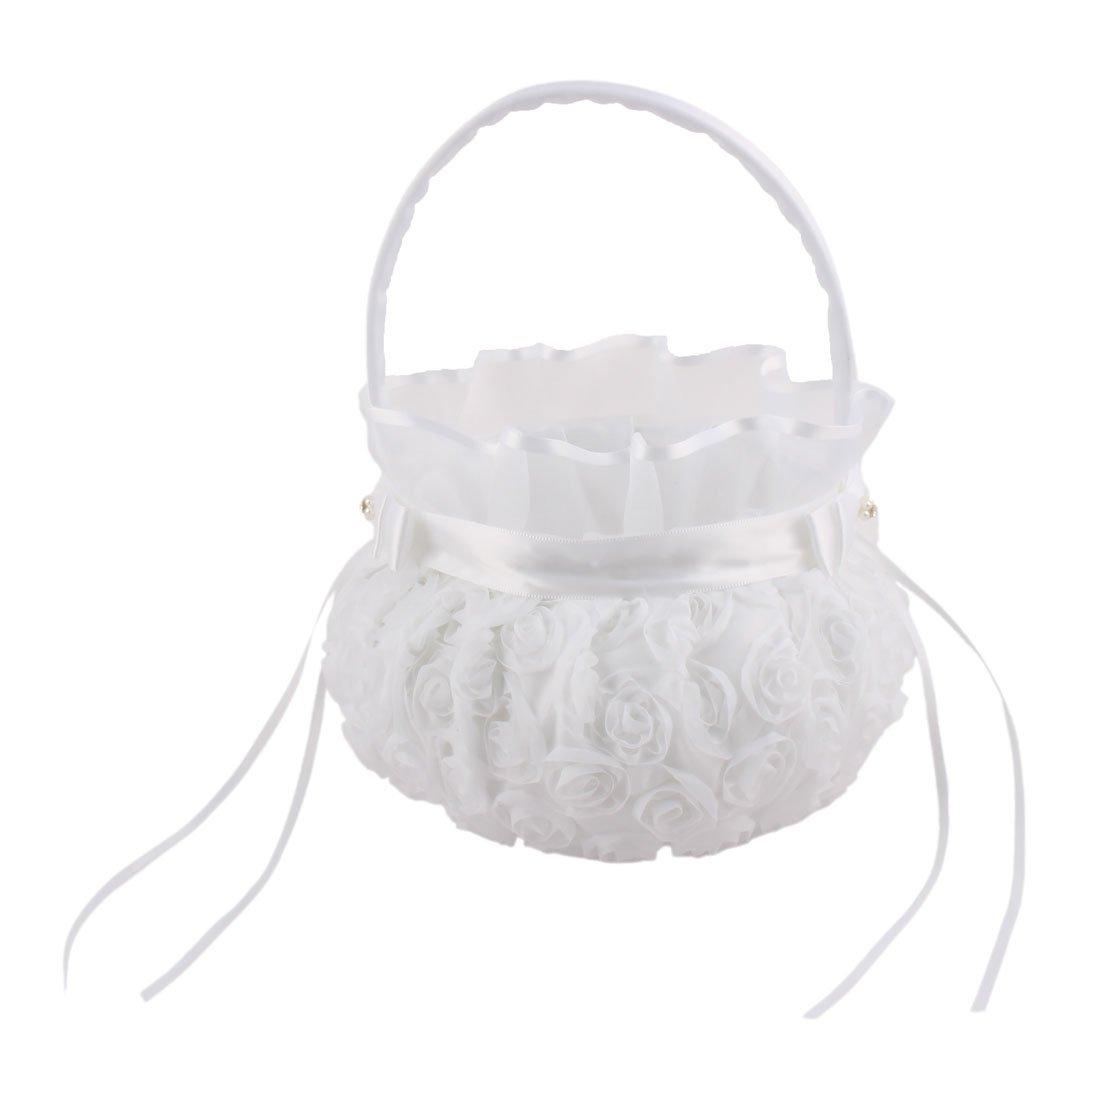 uxcell Satin Wedding Bowknots Rose Decor Petals Storage Flower Girl Carry Basket White